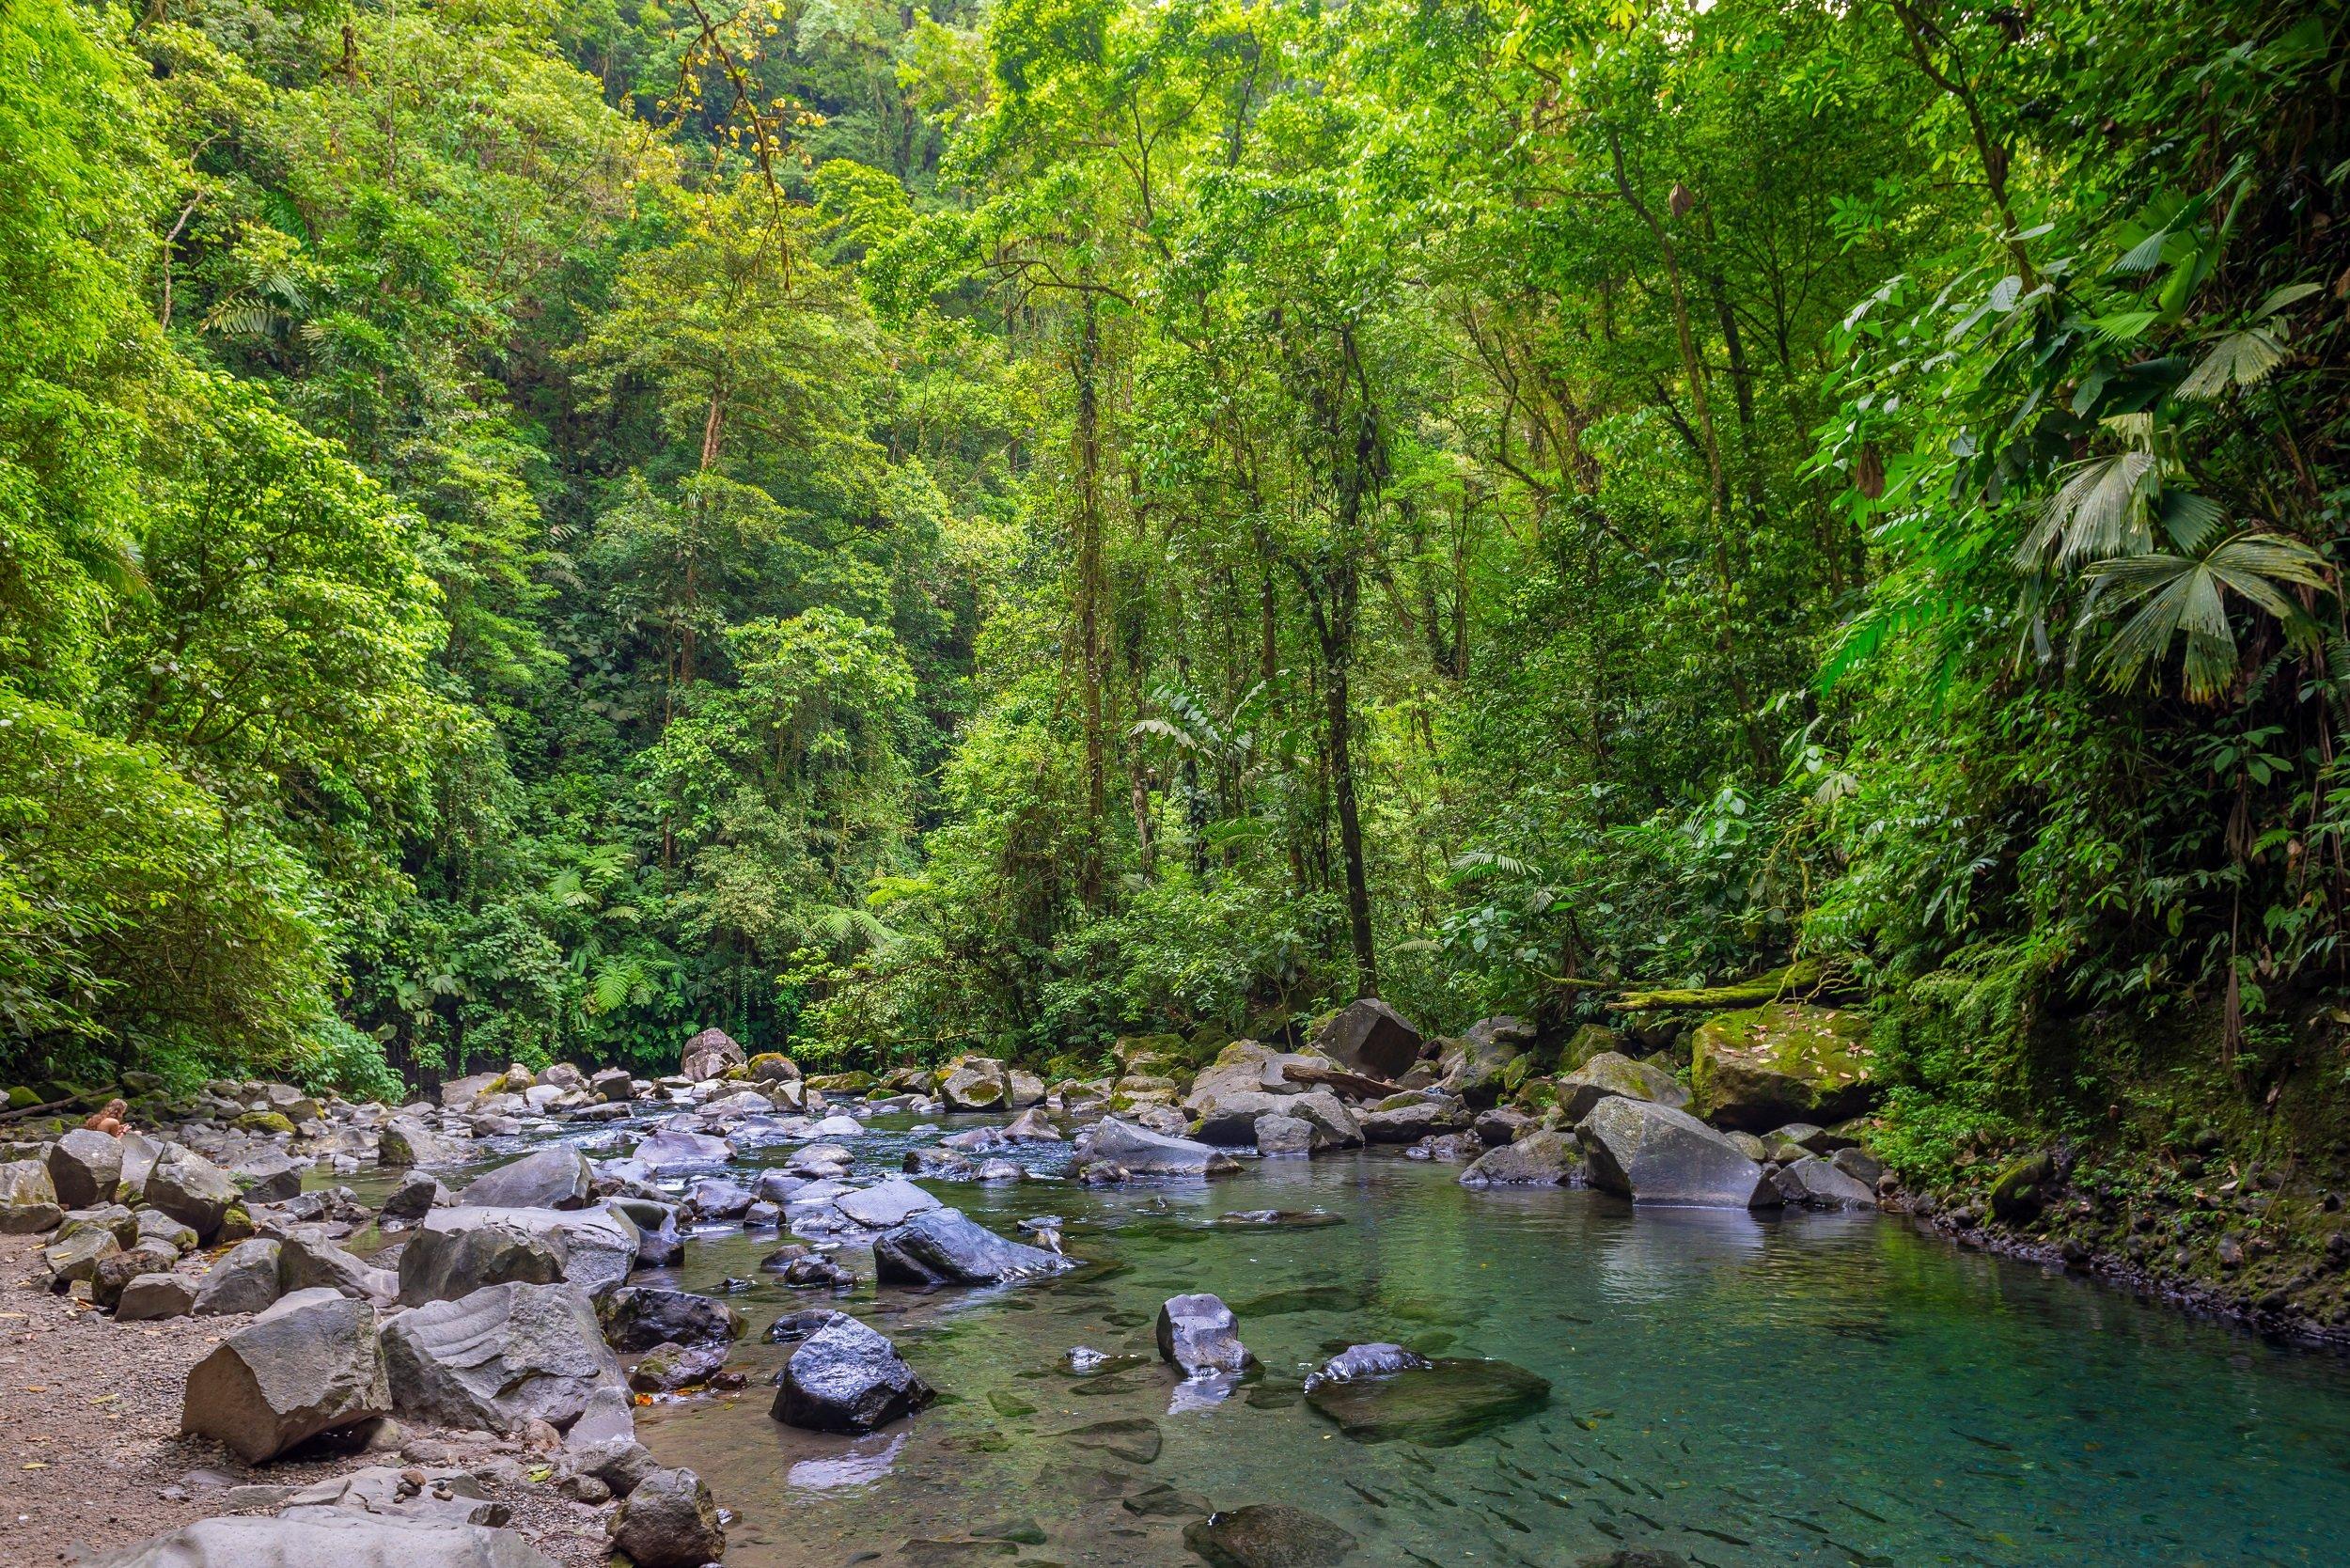 Peñas Blancas River Safari And La Fortuna Waterfall Tour From La Fortuna & Arenal